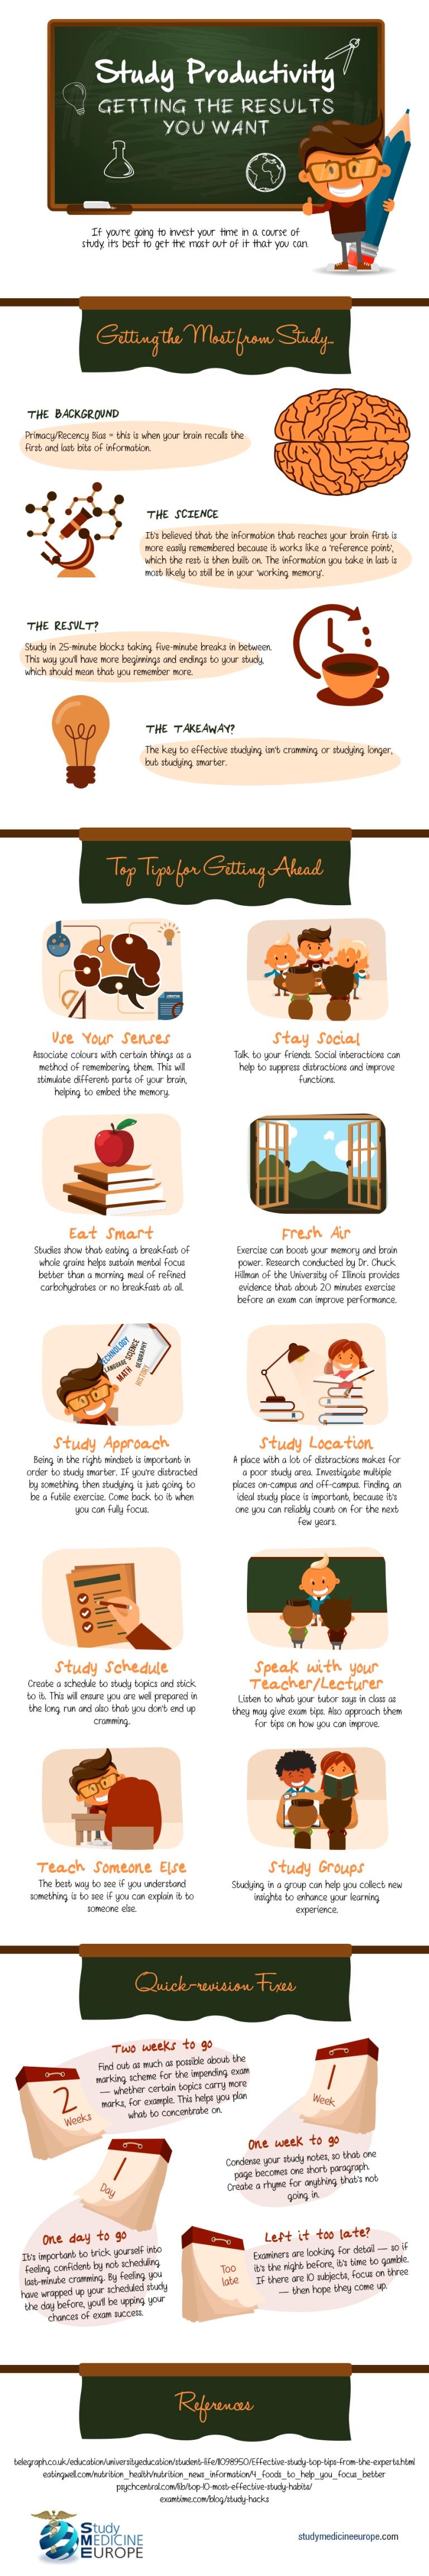 Study-Smart.jpg